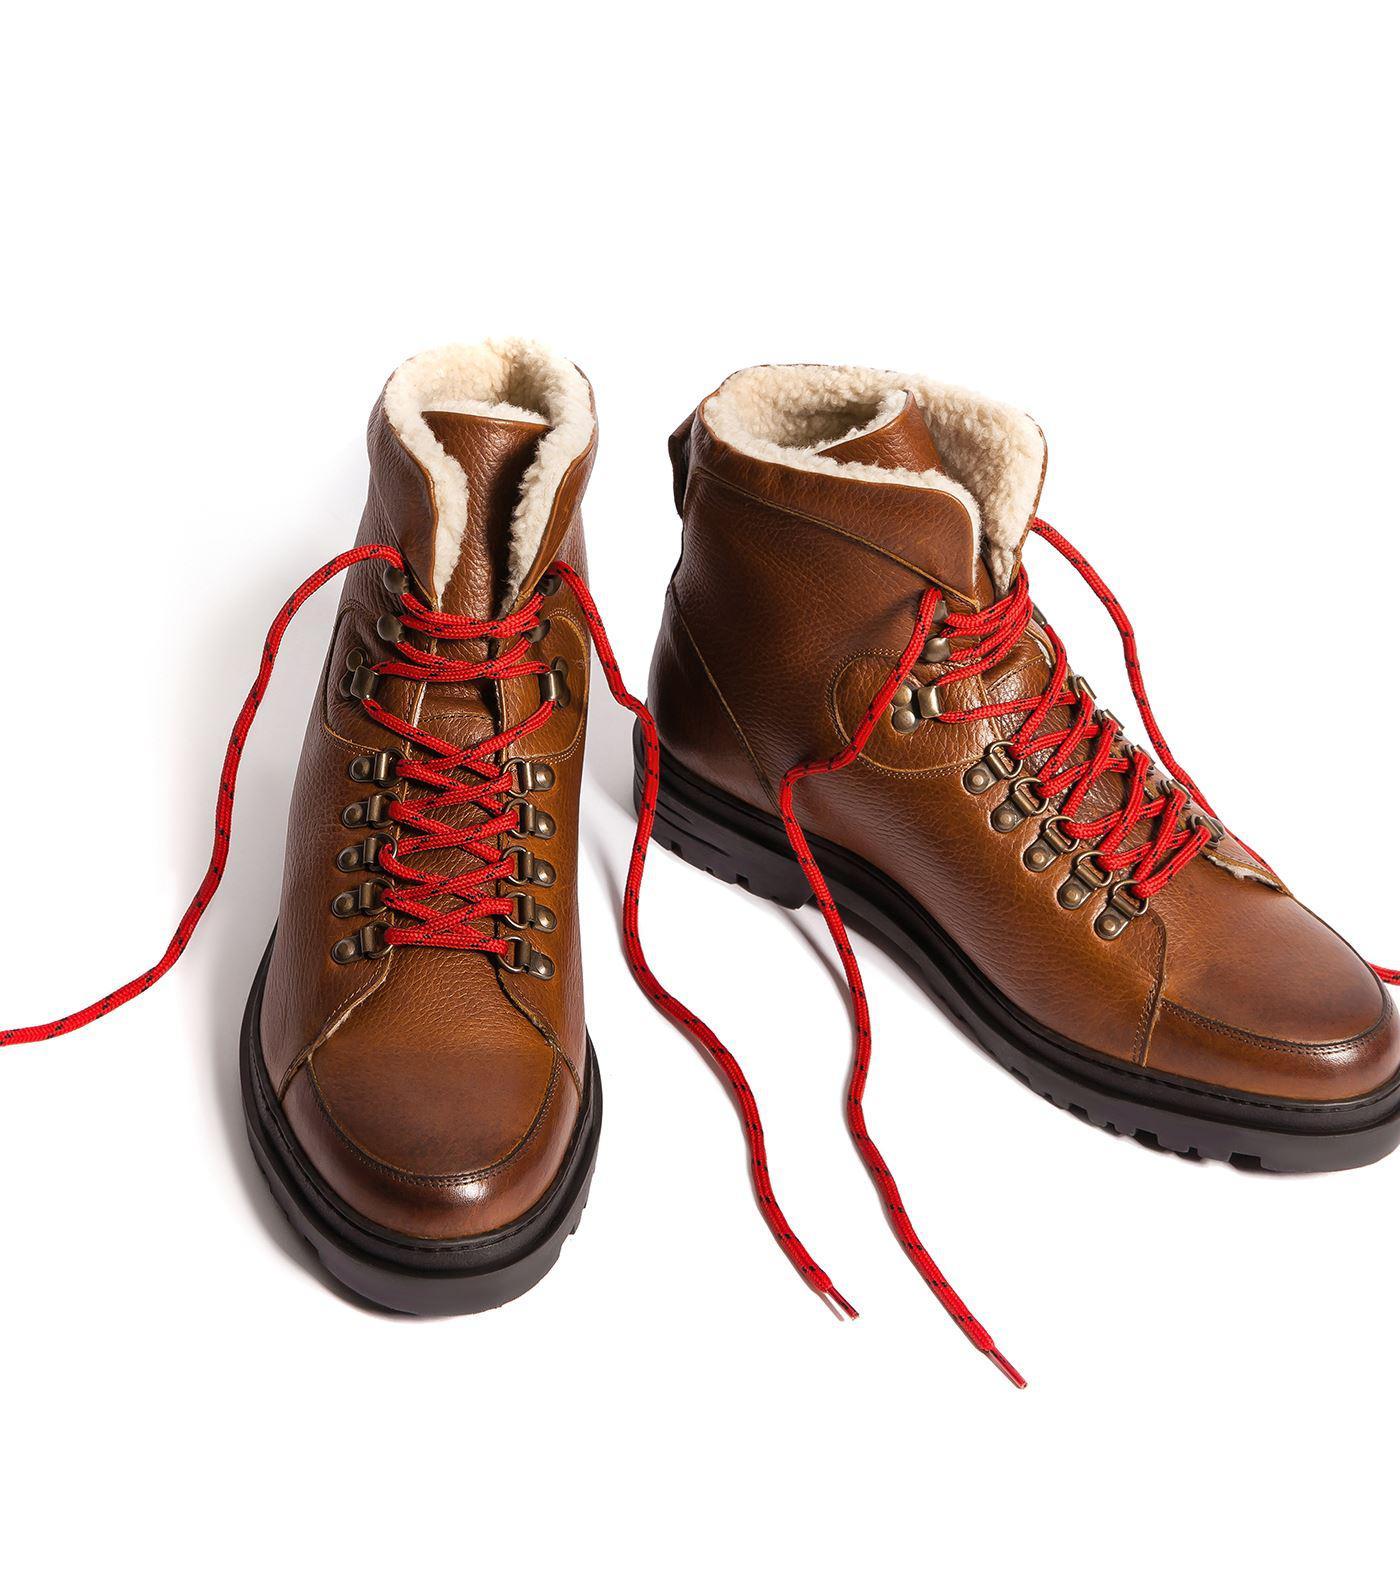 3537d962b14 Kurt Geiger Amber Hiking Boots in Natural for Men - Lyst